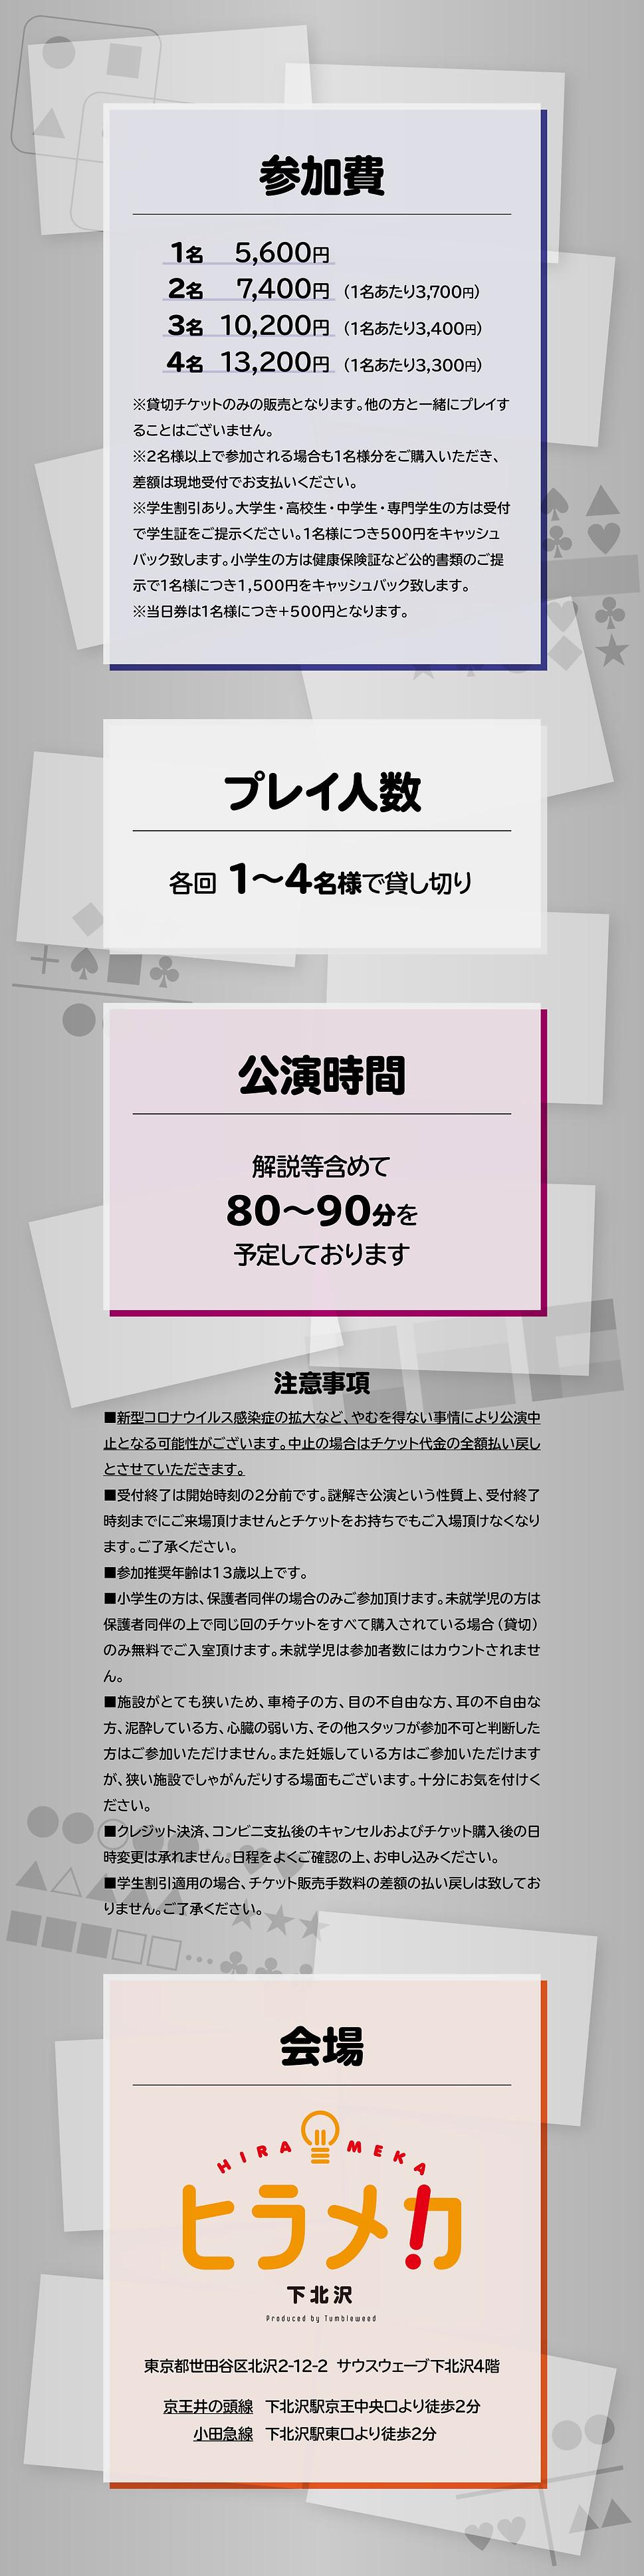 nazomamire__3.jpg